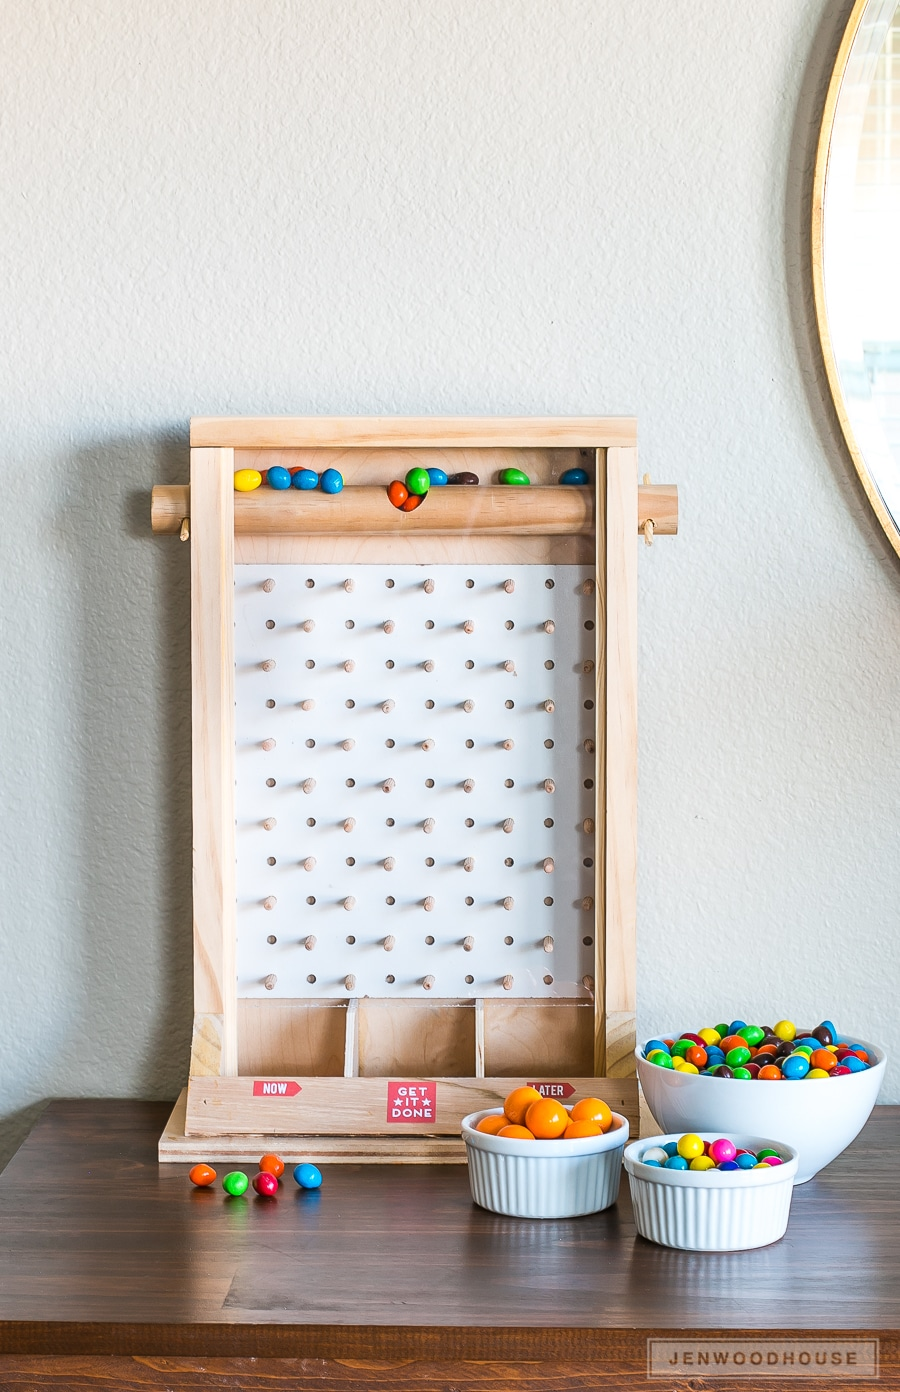 How to make a DIY plinko game that's a fun candy dispenser